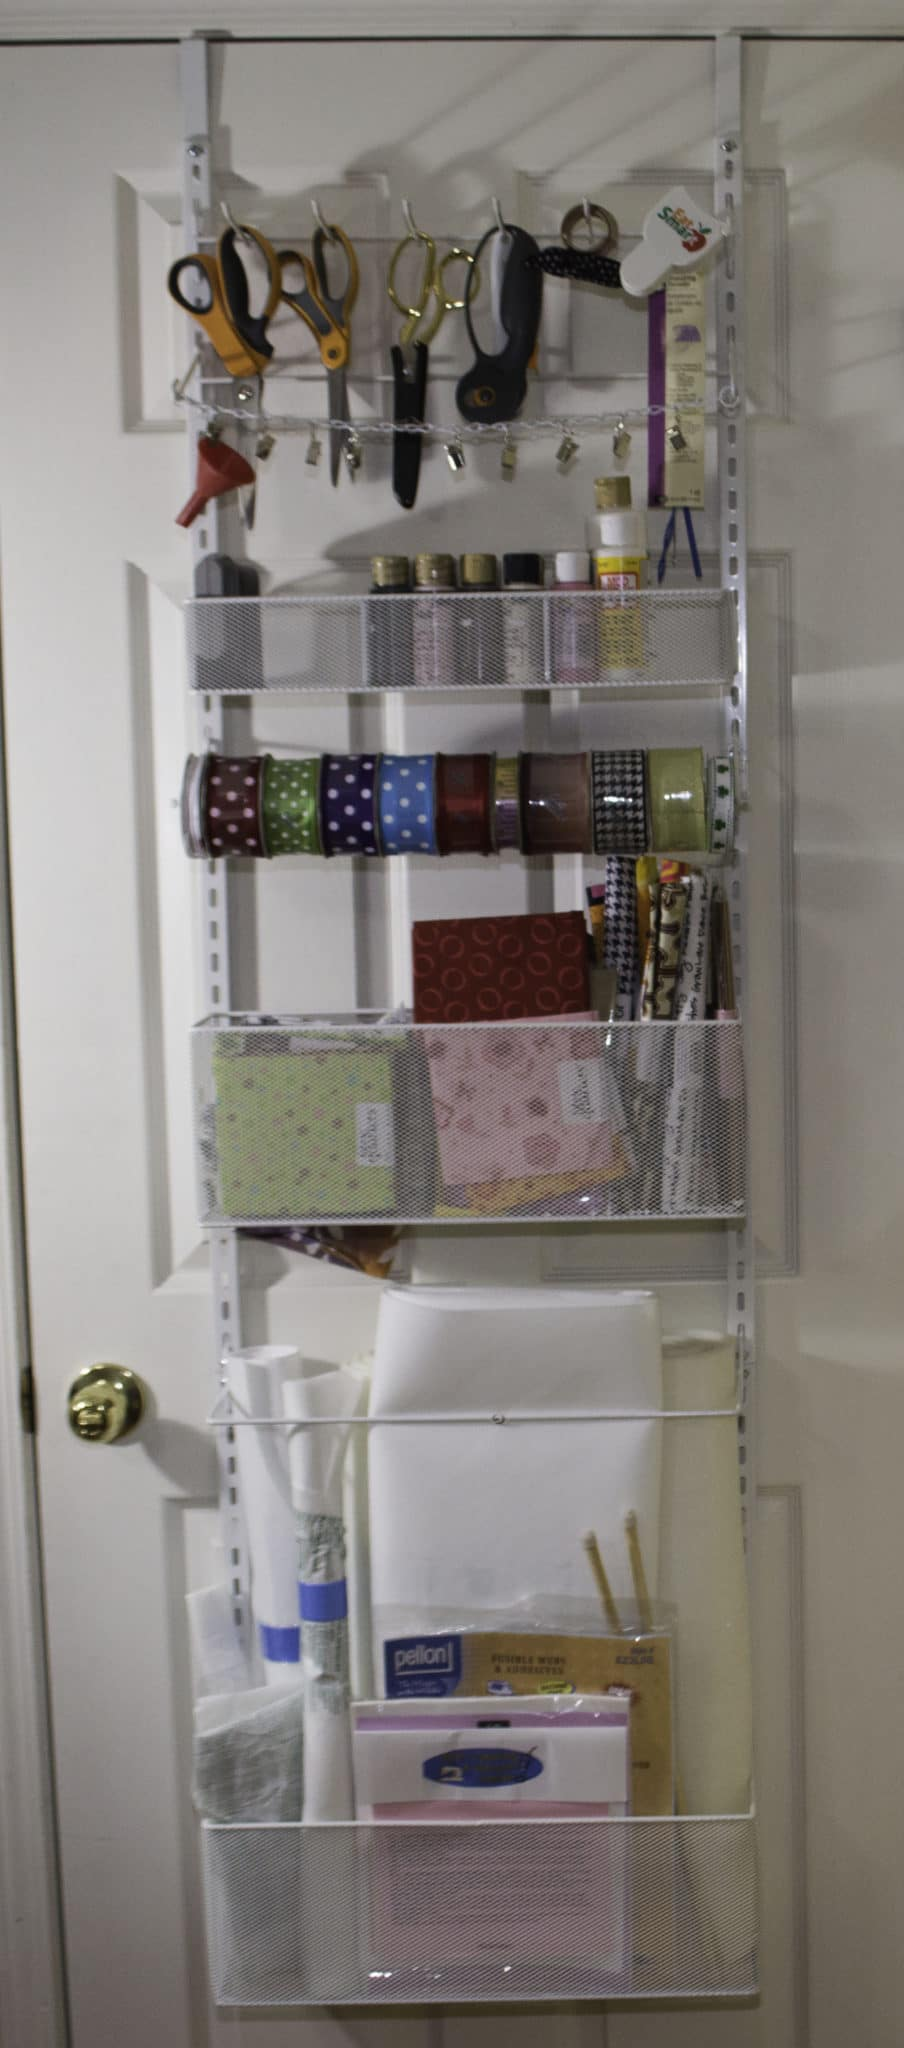 Over The Door 3 Tier Bathroom Towel Bar Rack Chrome W: Sewing Room Organizing Hacks